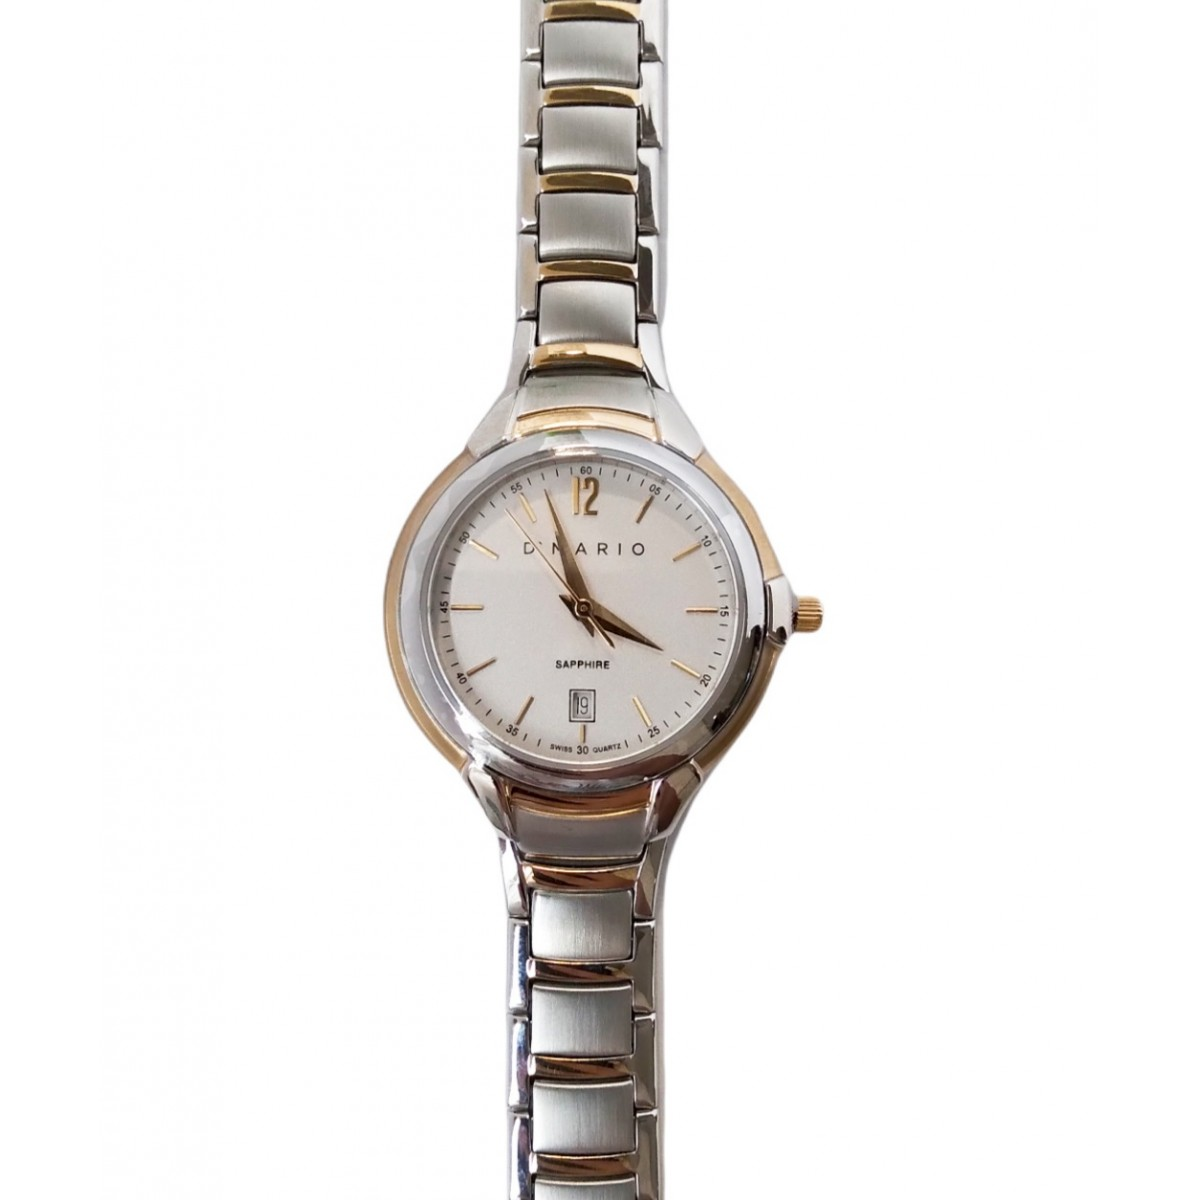 https://www.gaberjoyeria.com/6051-thickbox_default/reloj-dmario-.jpg